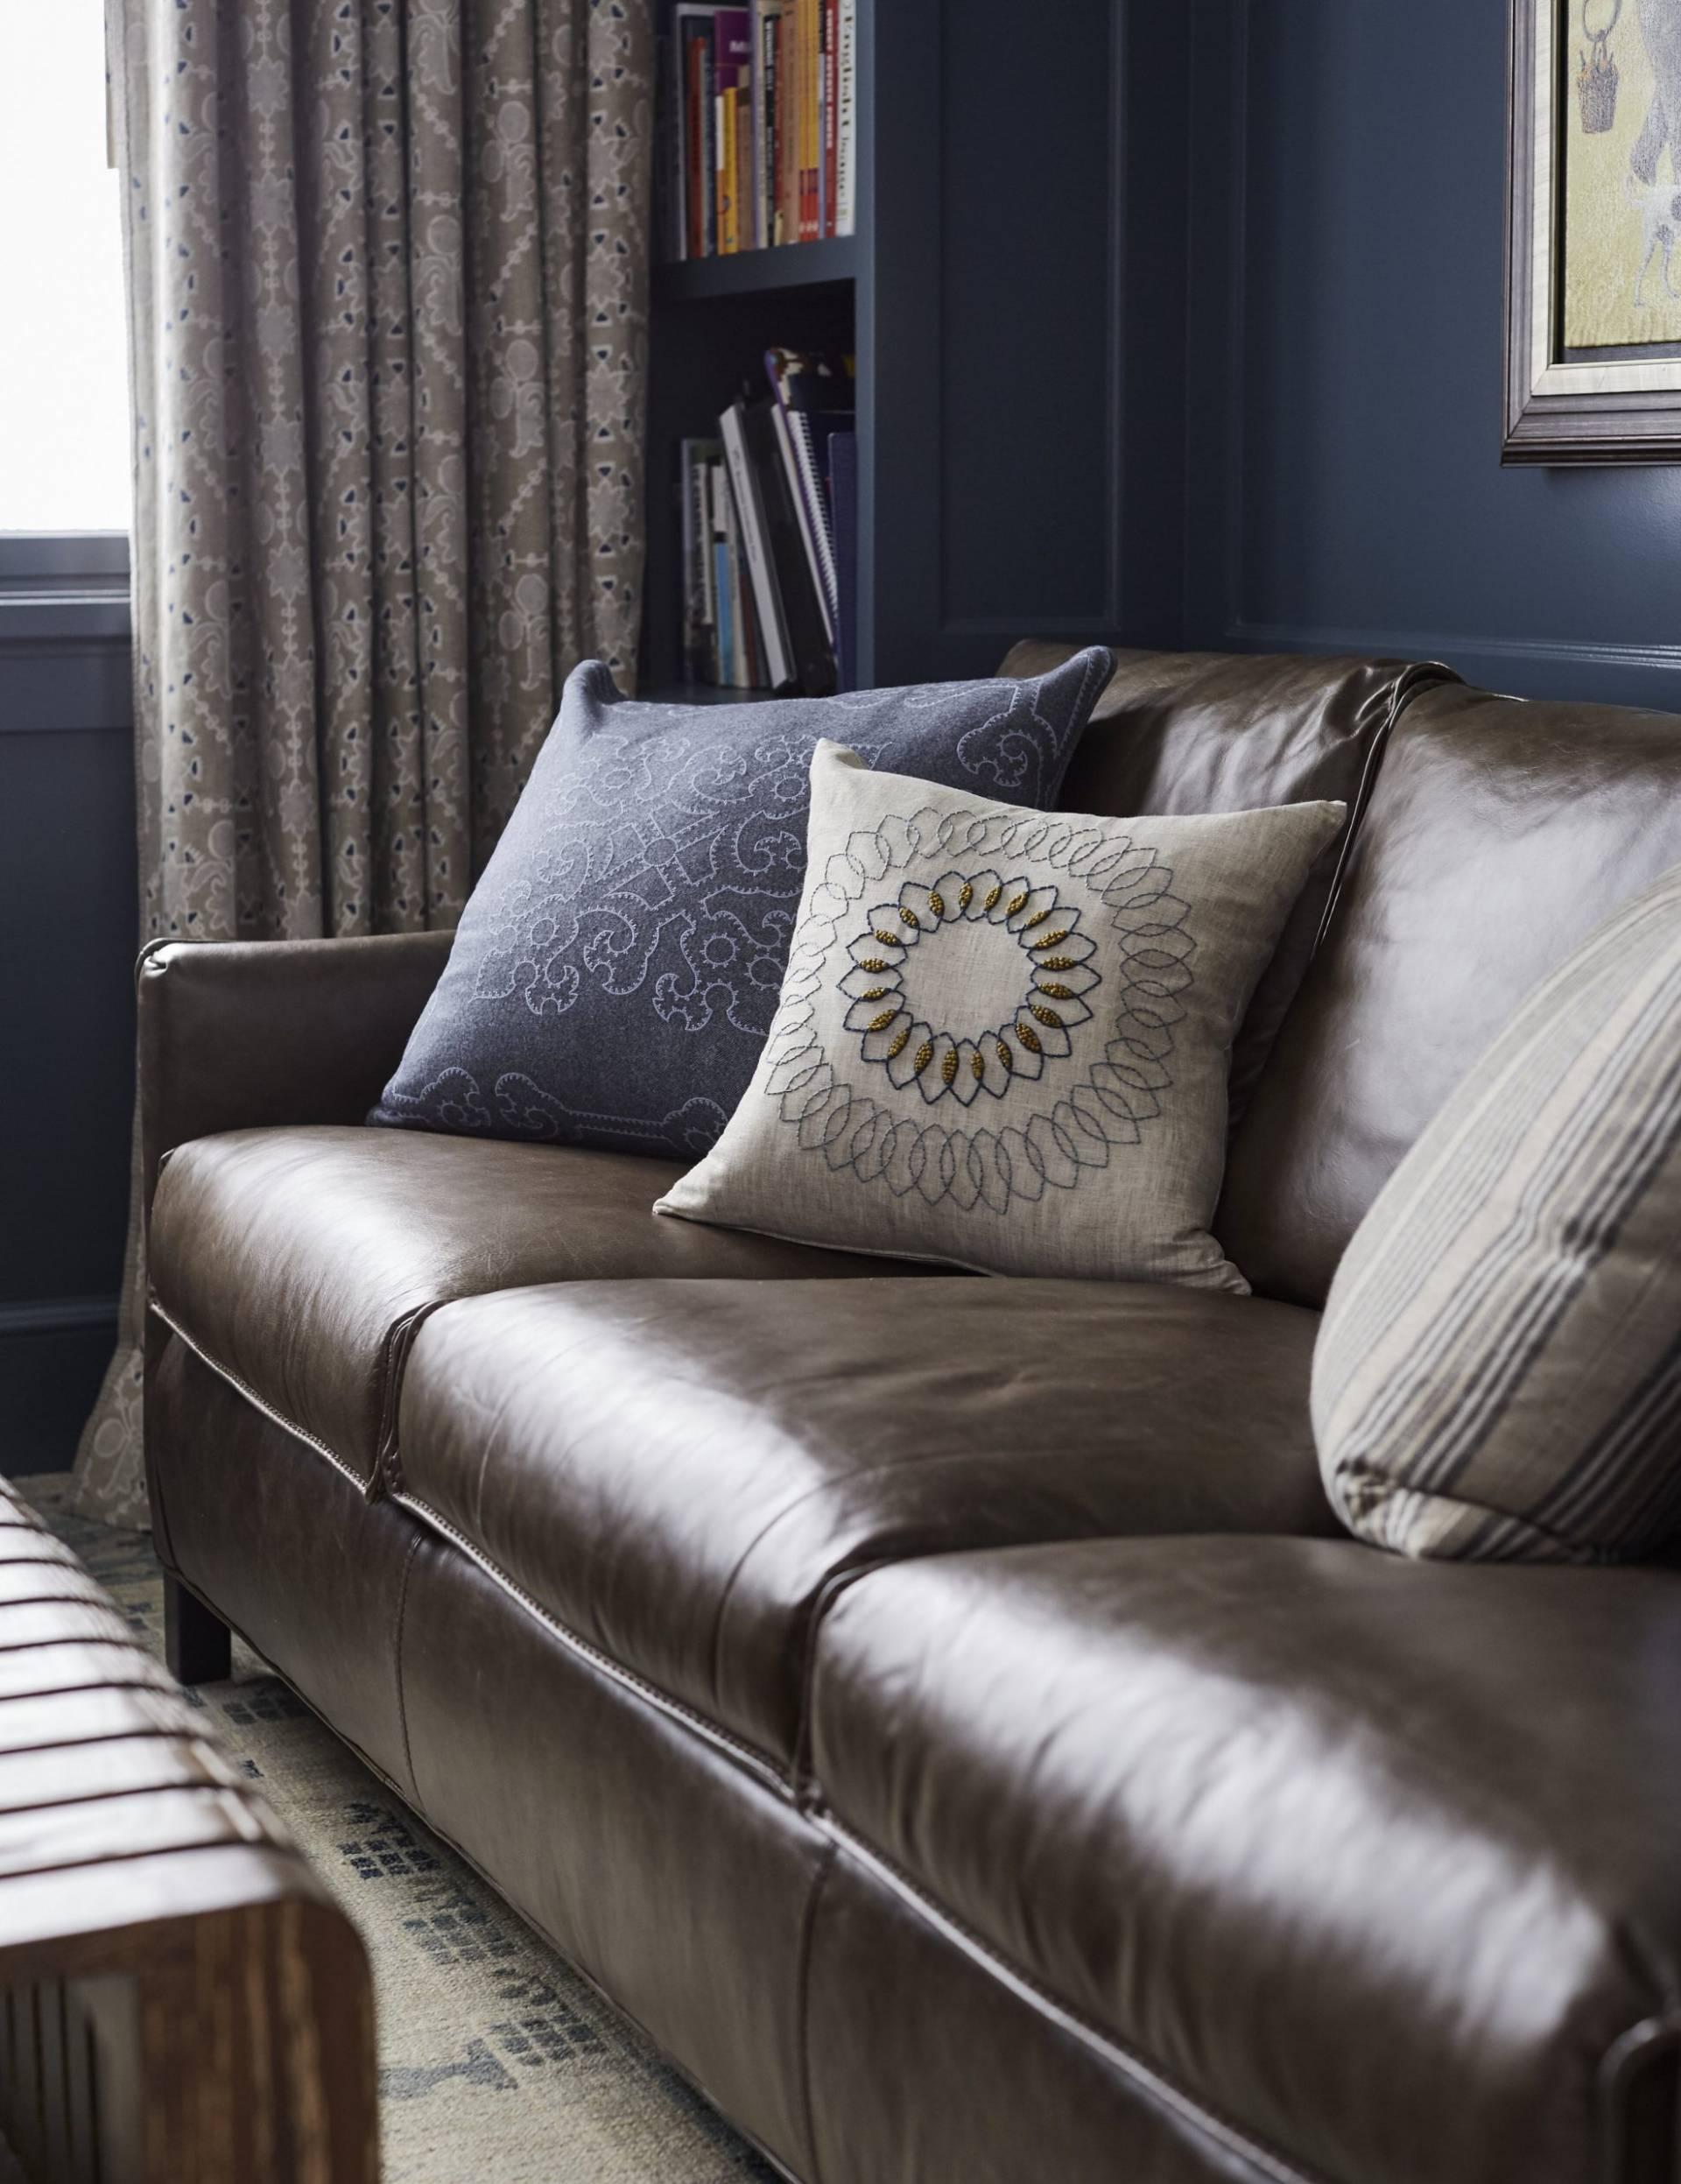 Brown leather sofa and custom throw pillows